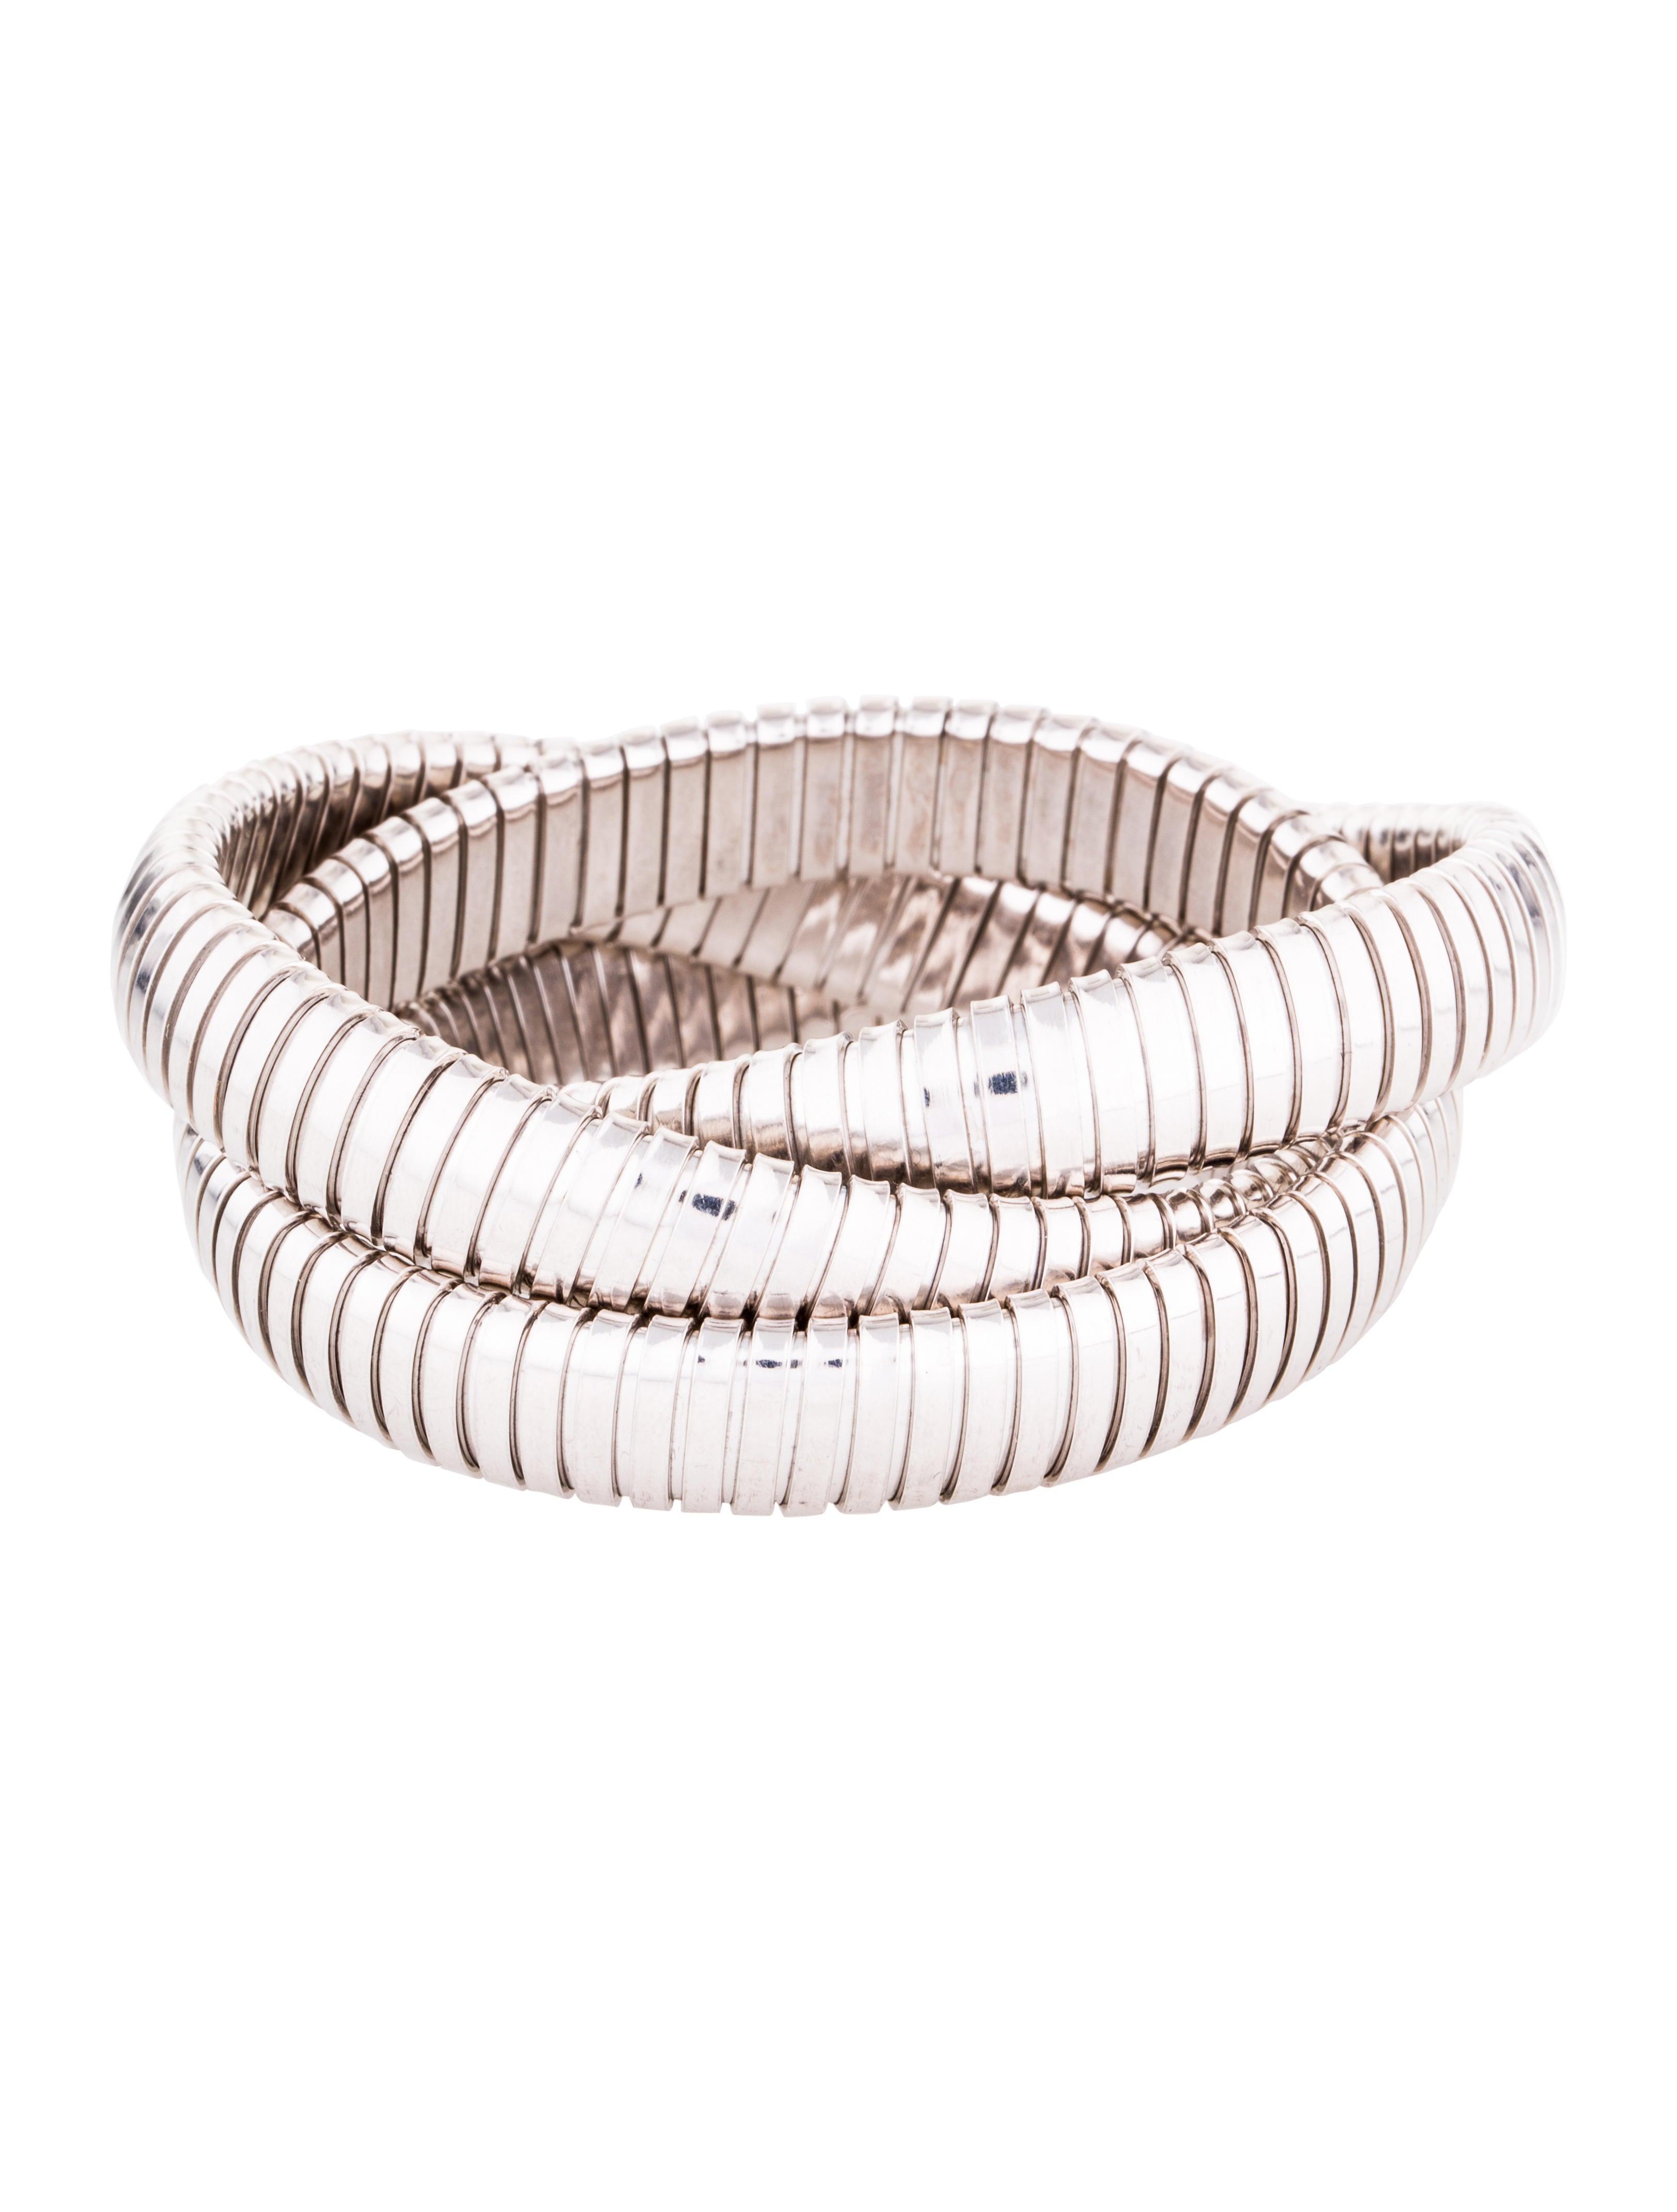 Sidney Garber Triple Rolling Bangle Bracelet Bracelets Sga20033